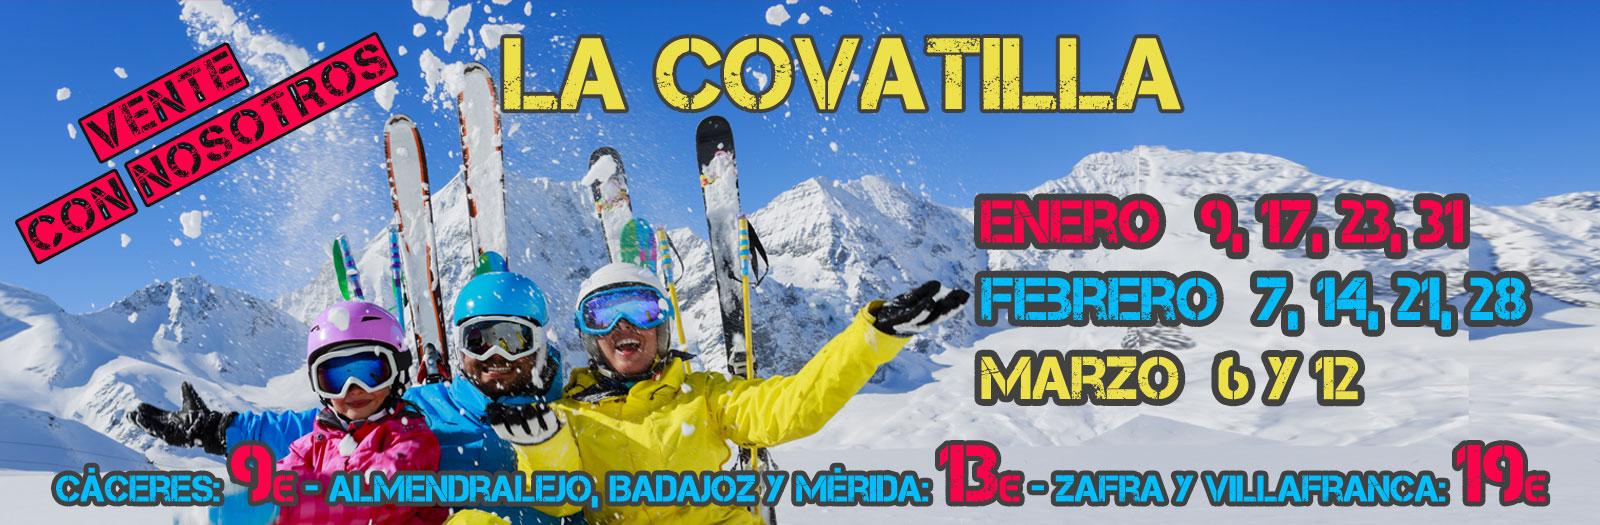 La Covatilla - LEDA